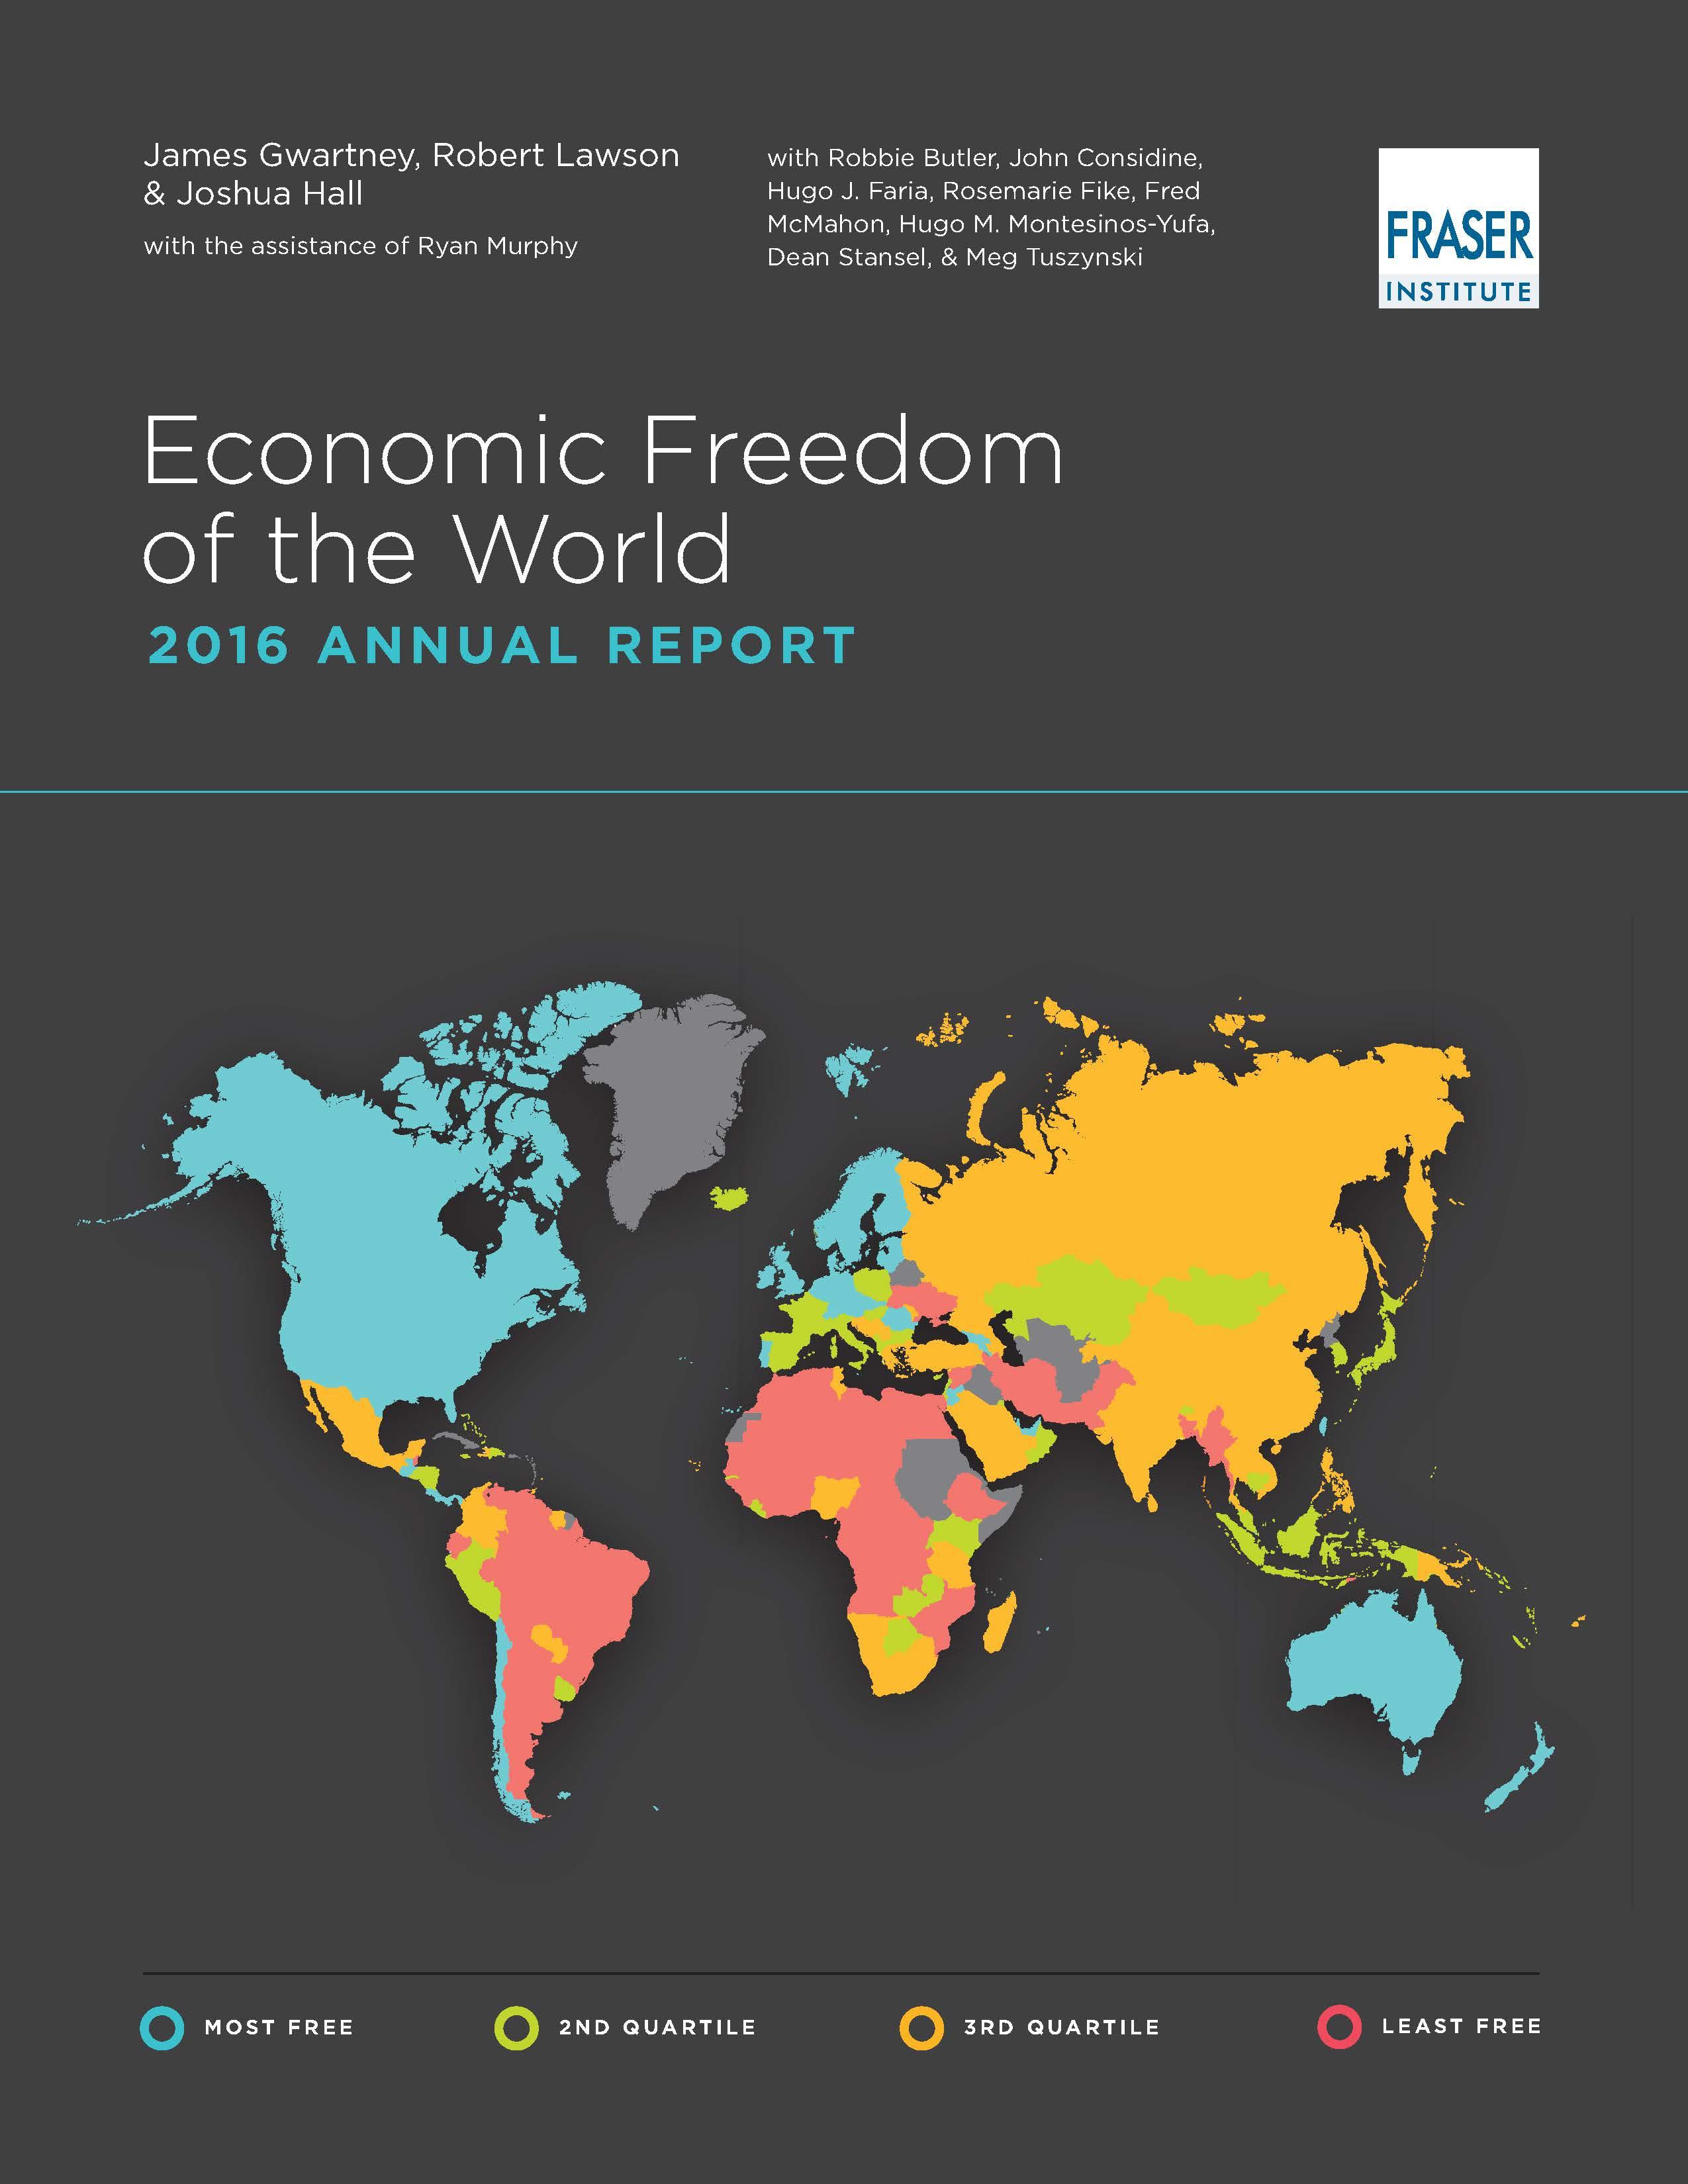 Economic Freedom of the World 2016